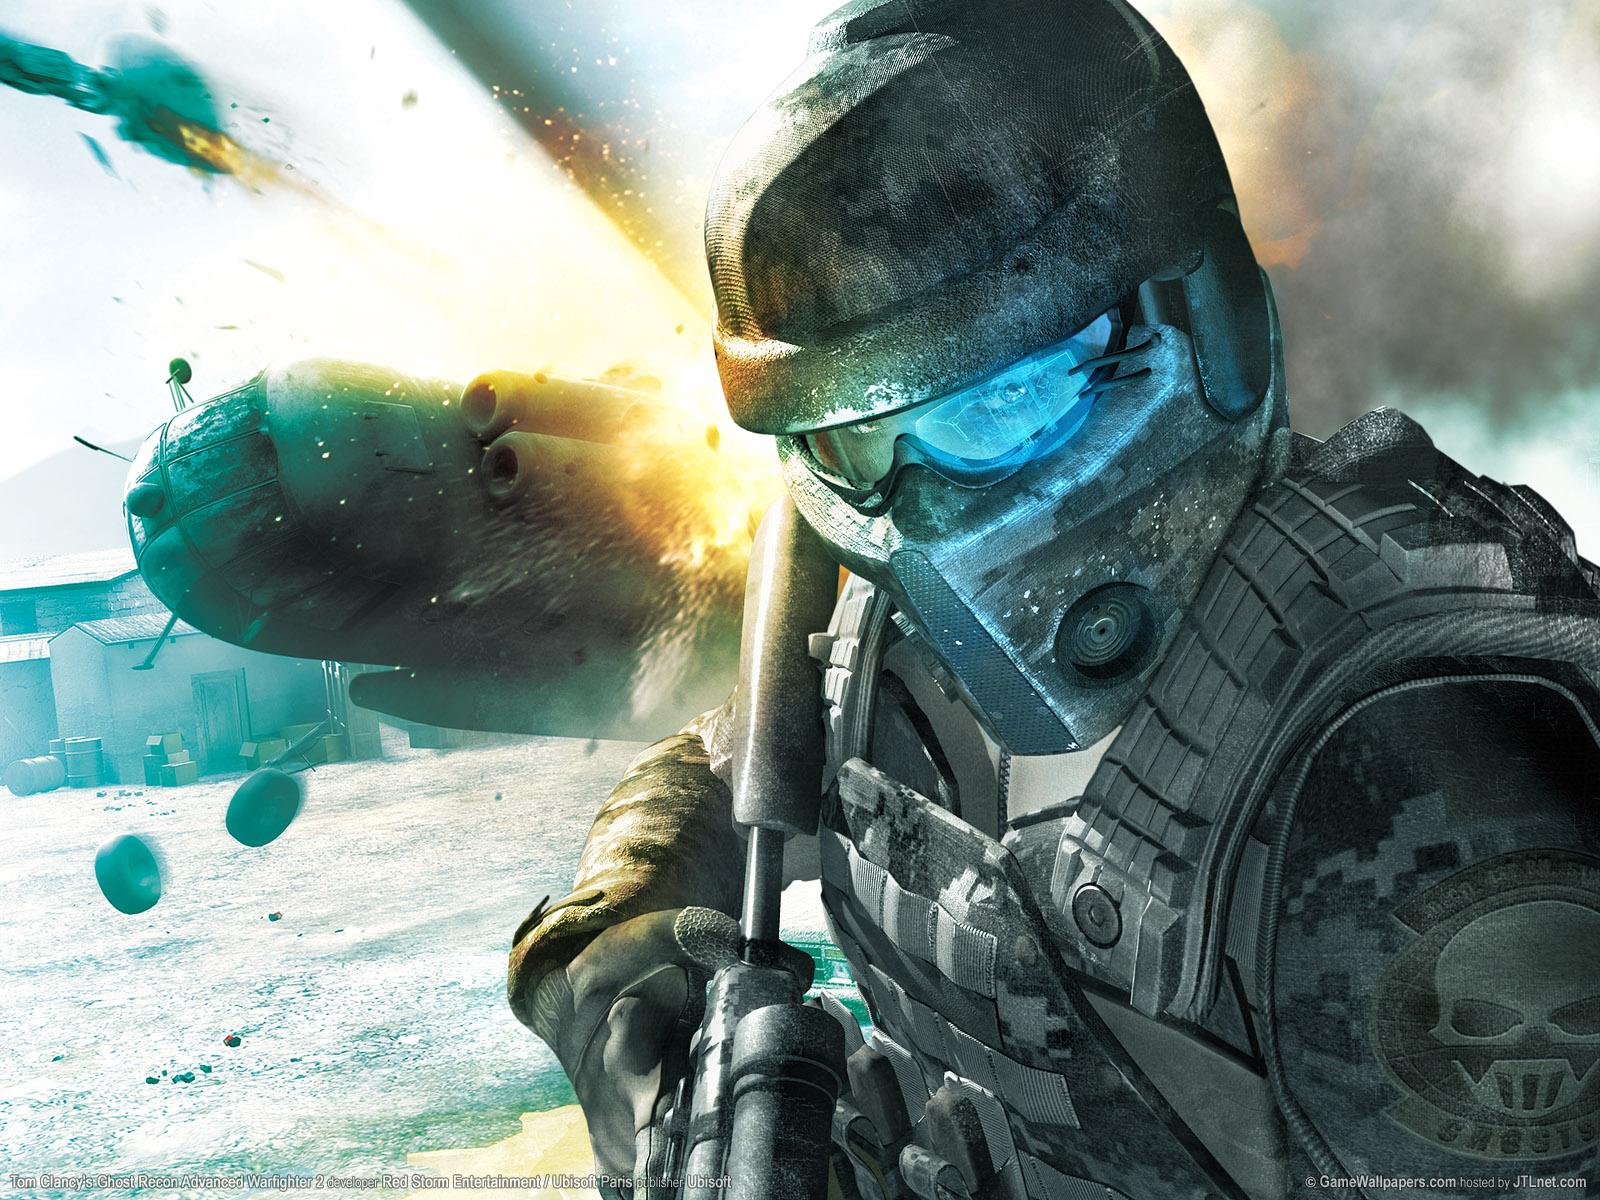 http://1.bp.blogspot.com/_ClE-N0fh1yU/TJ1-Aj7zyjI/AAAAAAAABLk/e4C7rKfzcW0/s1600/wallpaper_tom_clancys_ghost_recon_advanced_warfighter_2_01_1600.jpg